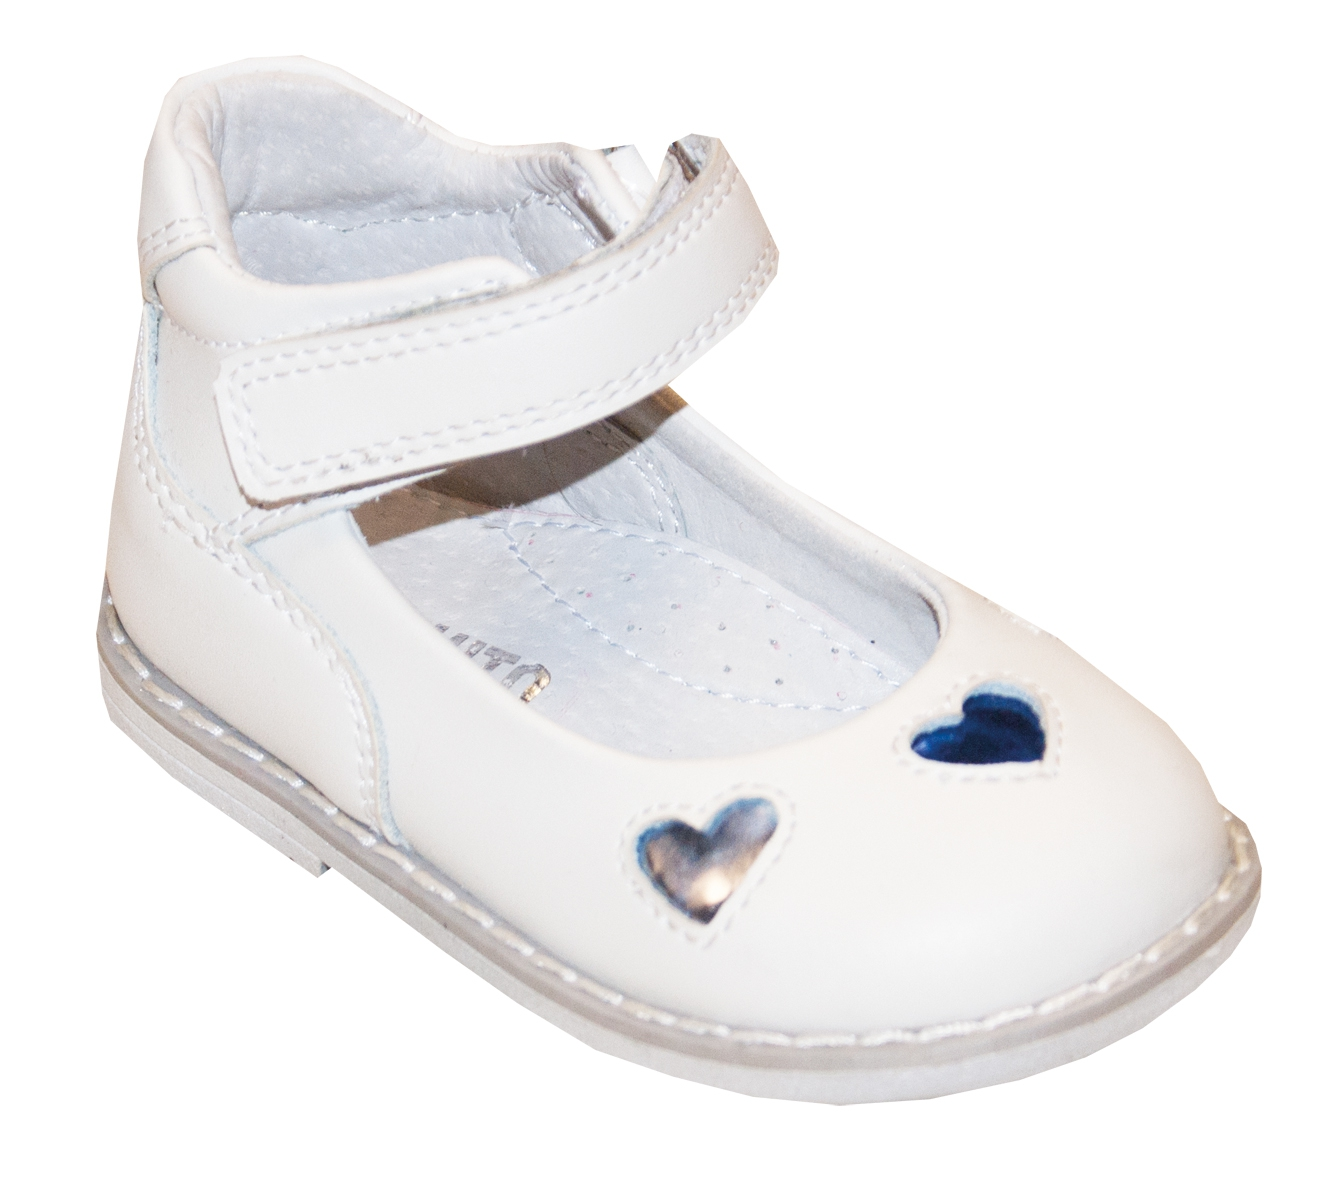 Туфли Barkito Туфли для девочки Barkito, белые aokang aokang мужские белые туфли